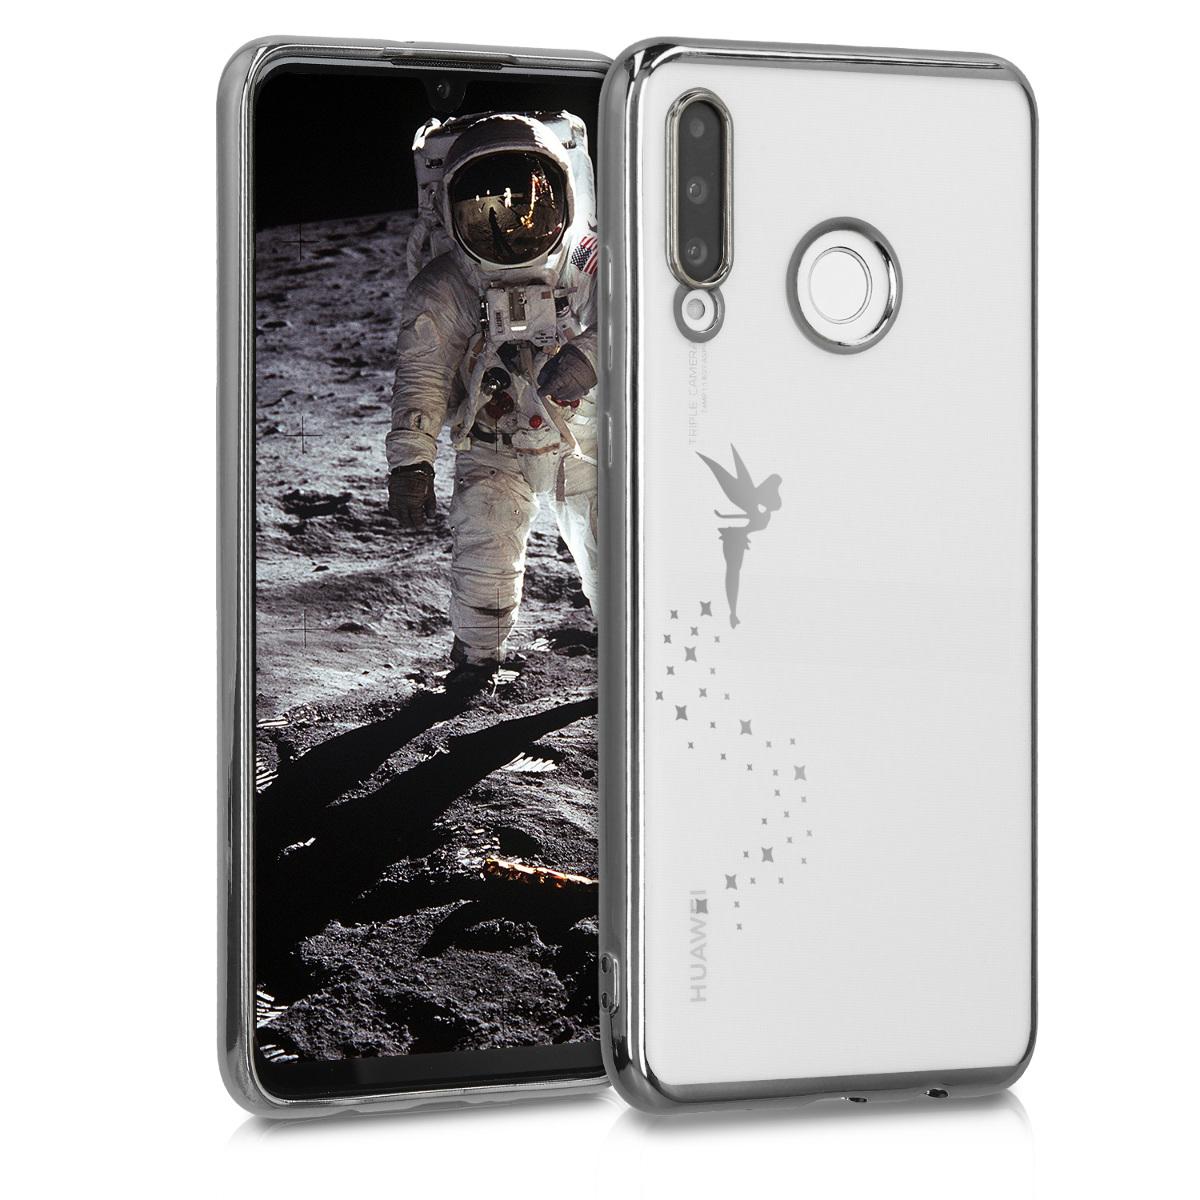 KW Θήκη Σιλικόνης Huawei P30 Lite - Silver / Transparent (49128.01)